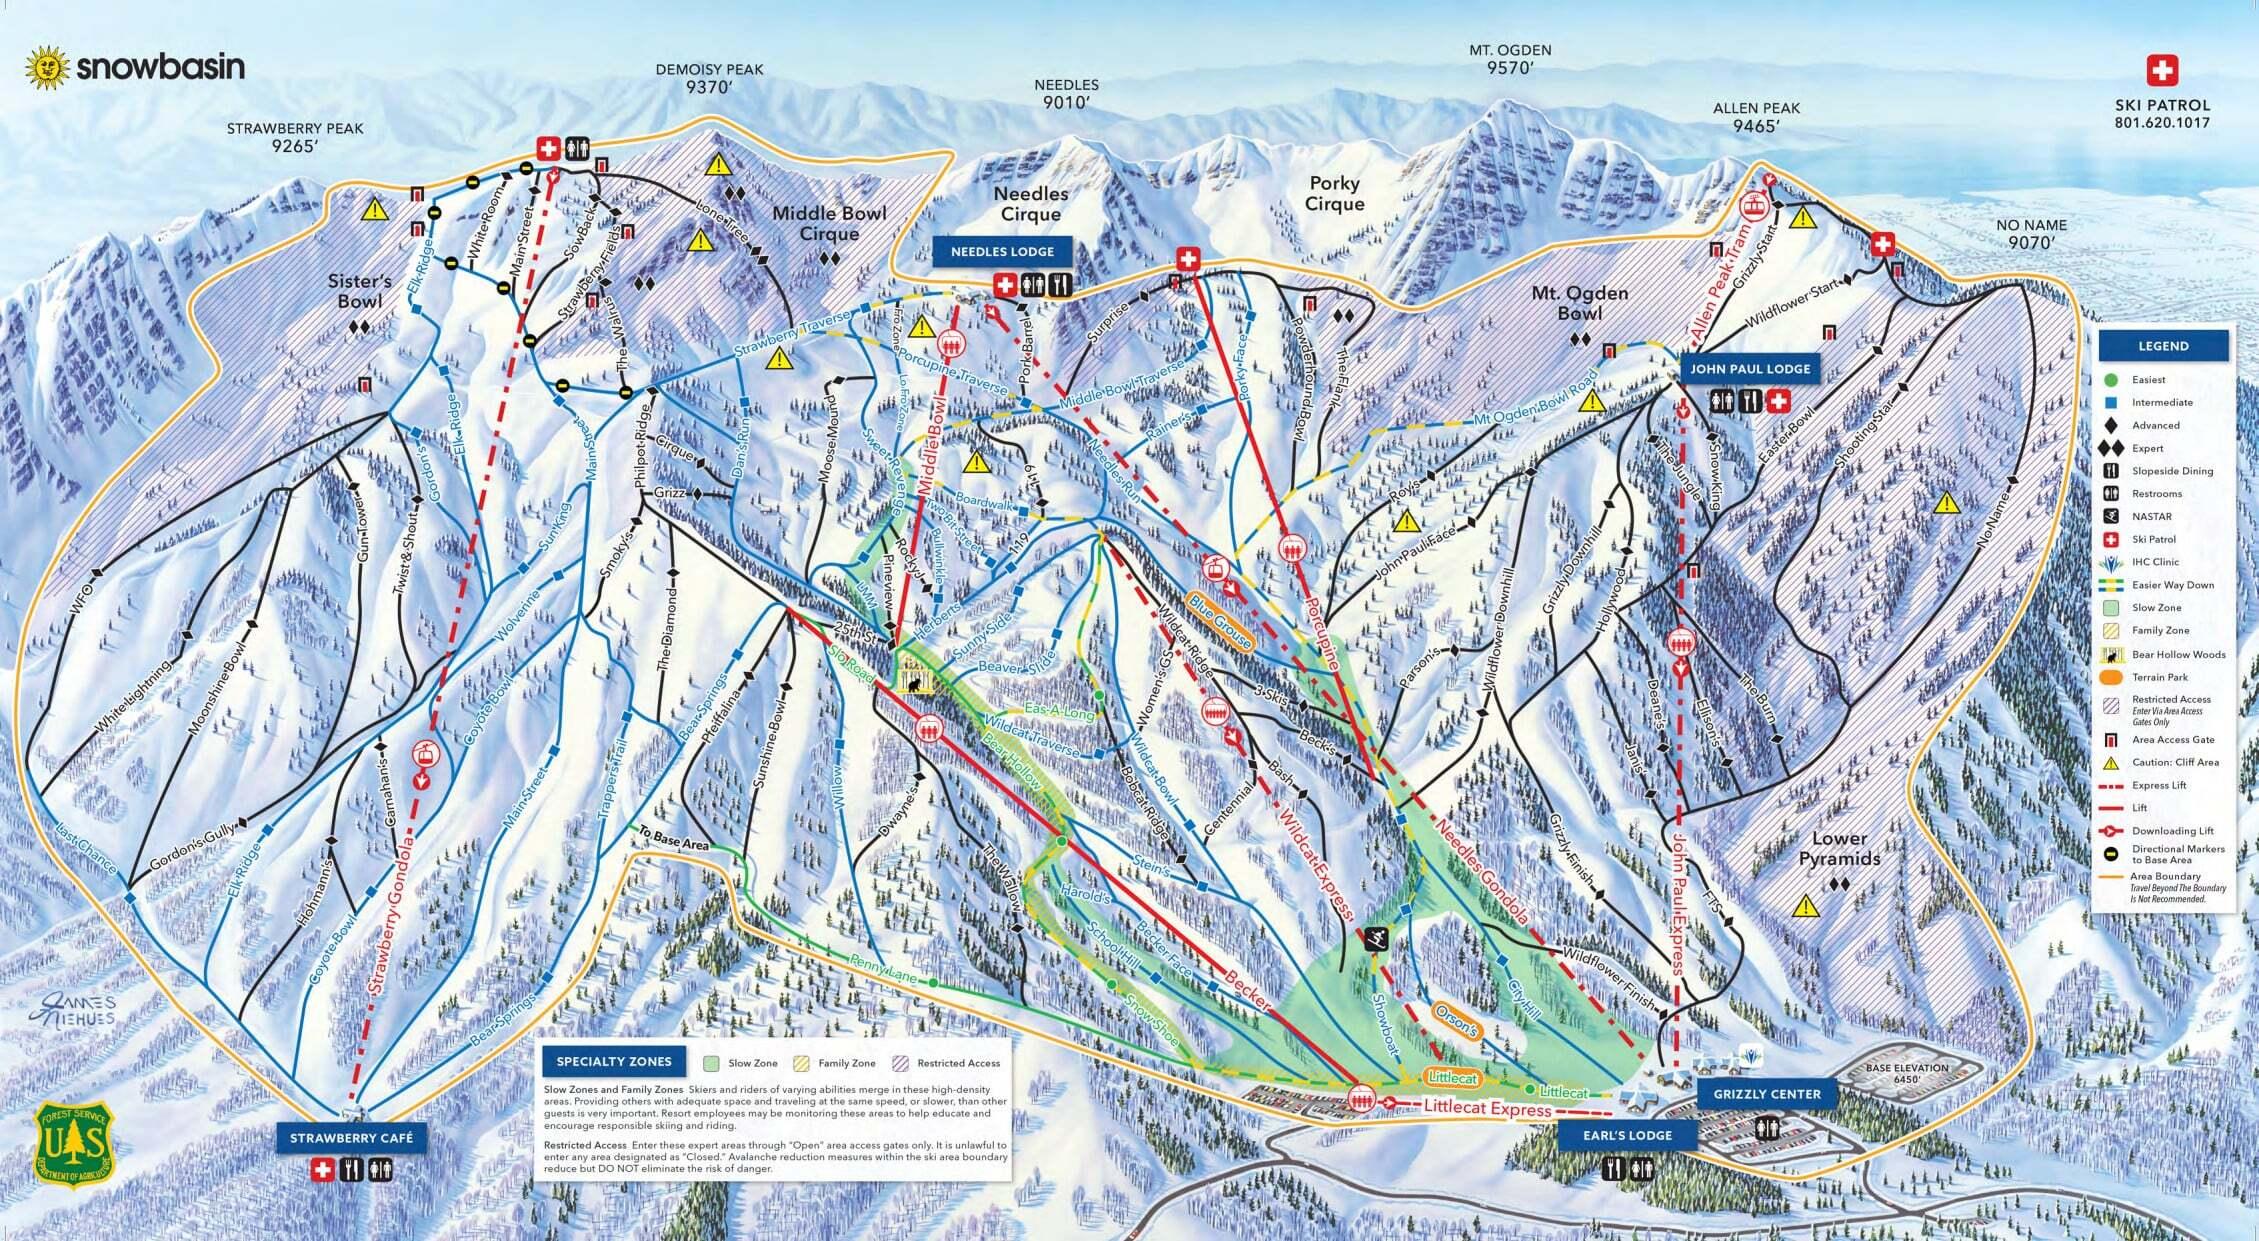 Snowbasin Piste / Trail Map